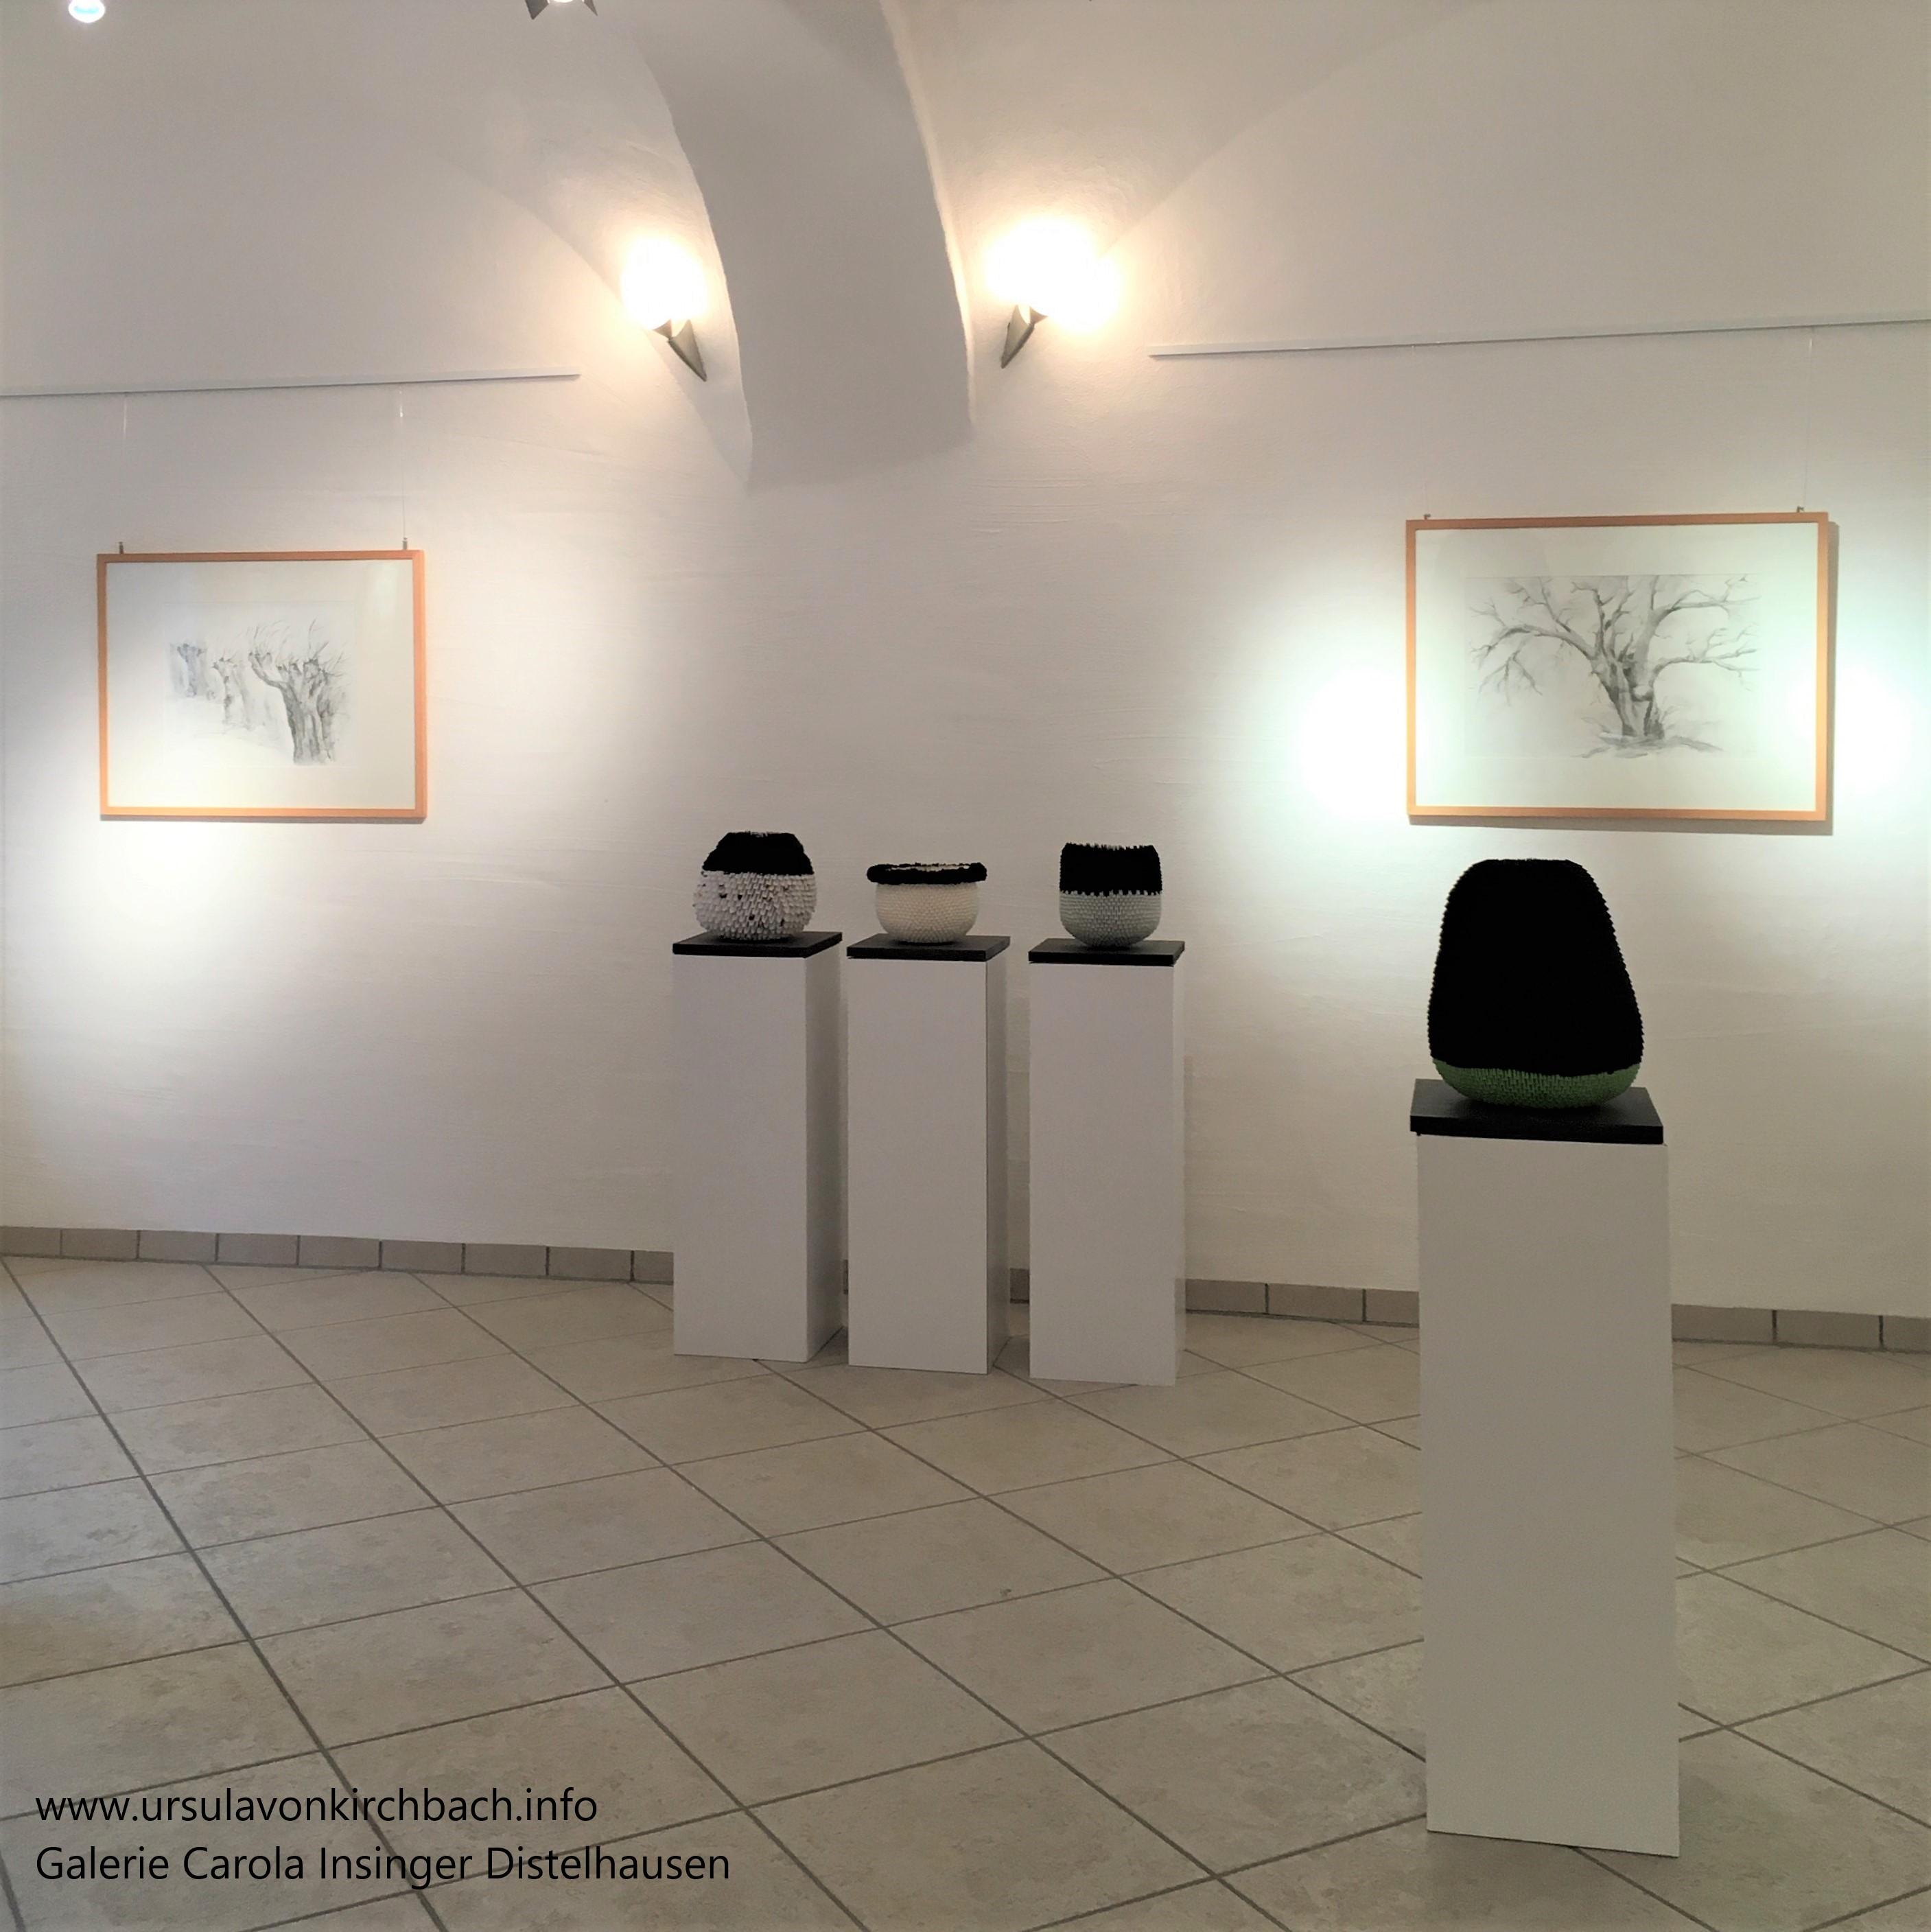 Galerie Carola Insinger Distelhausen